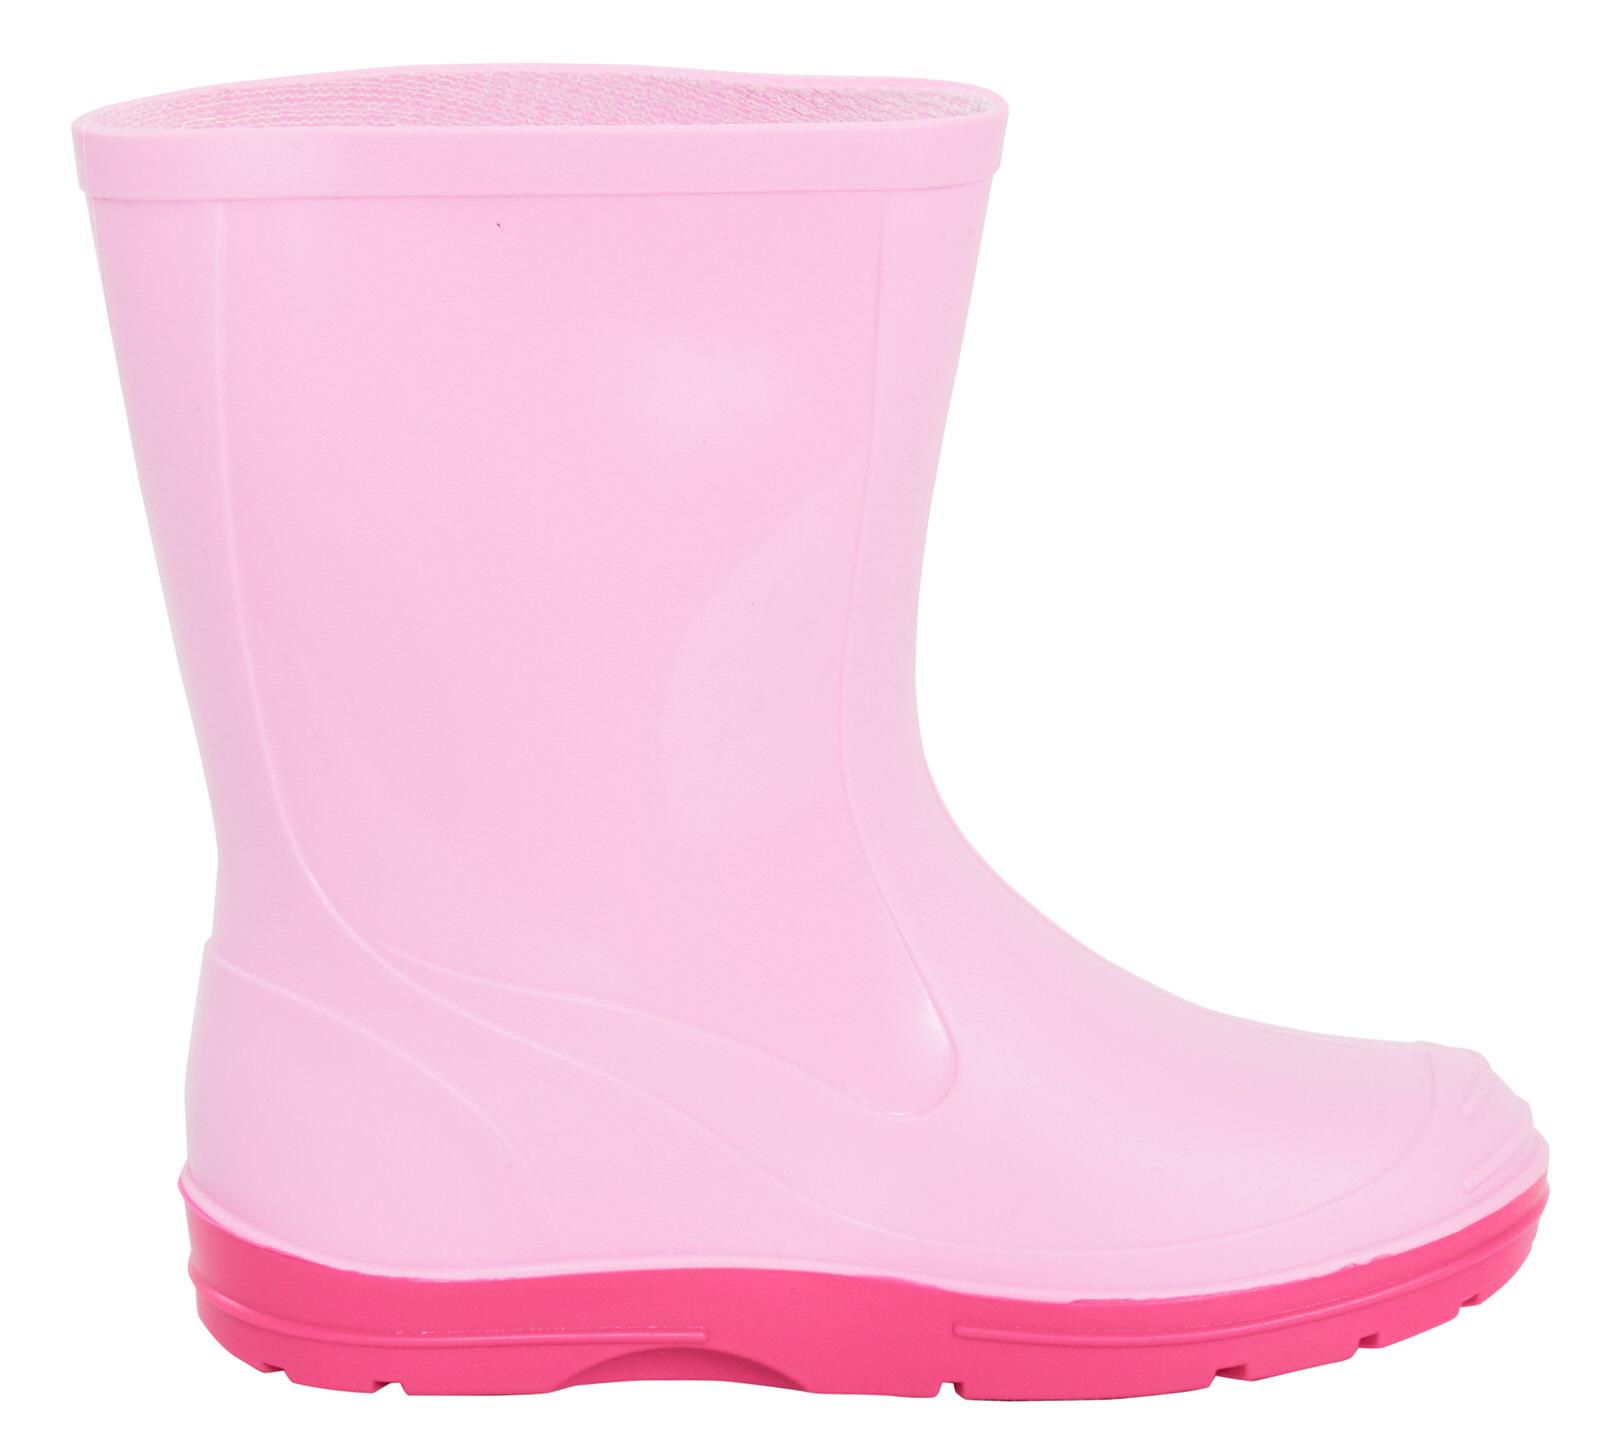 Girls Pink Wellies Mid Calf Rain Snow Boots Wellingtons Kids Waterproof Shoes